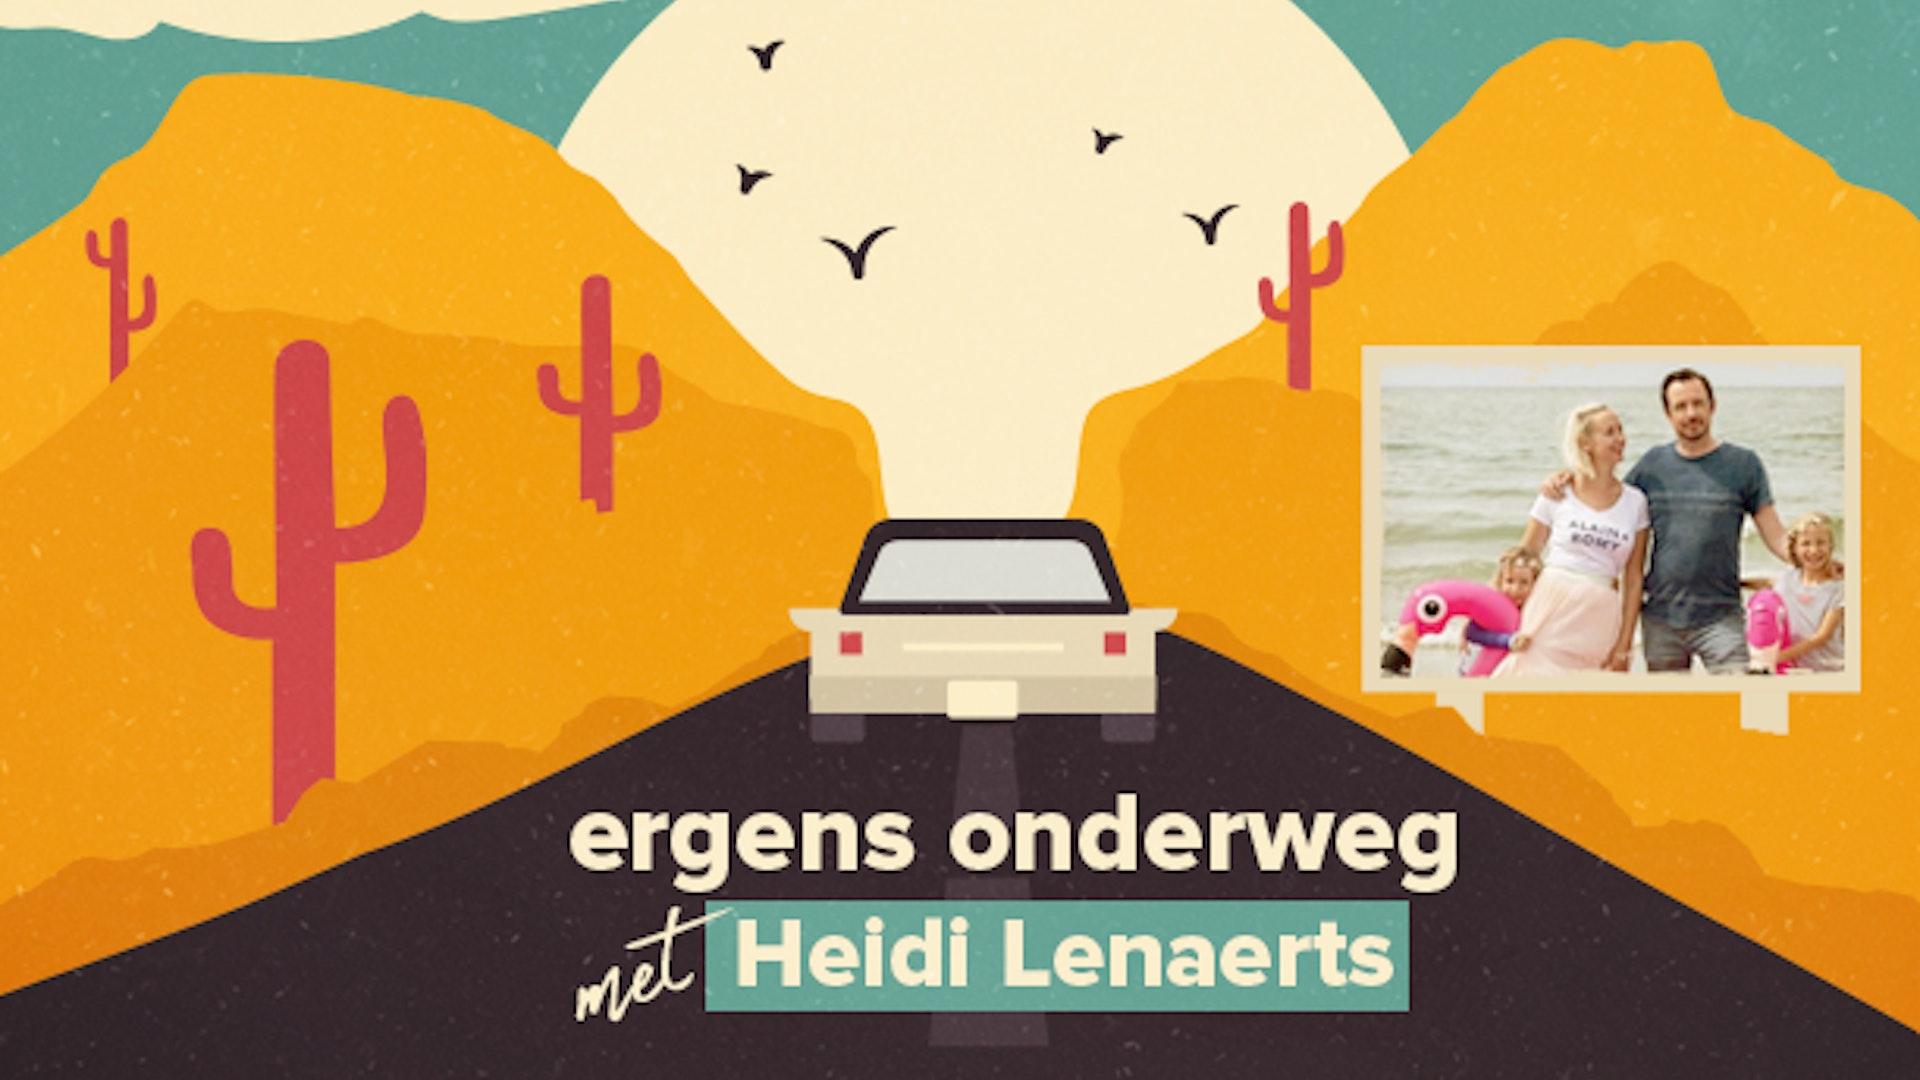 Ergens onderweg met Heidi Lenaerts